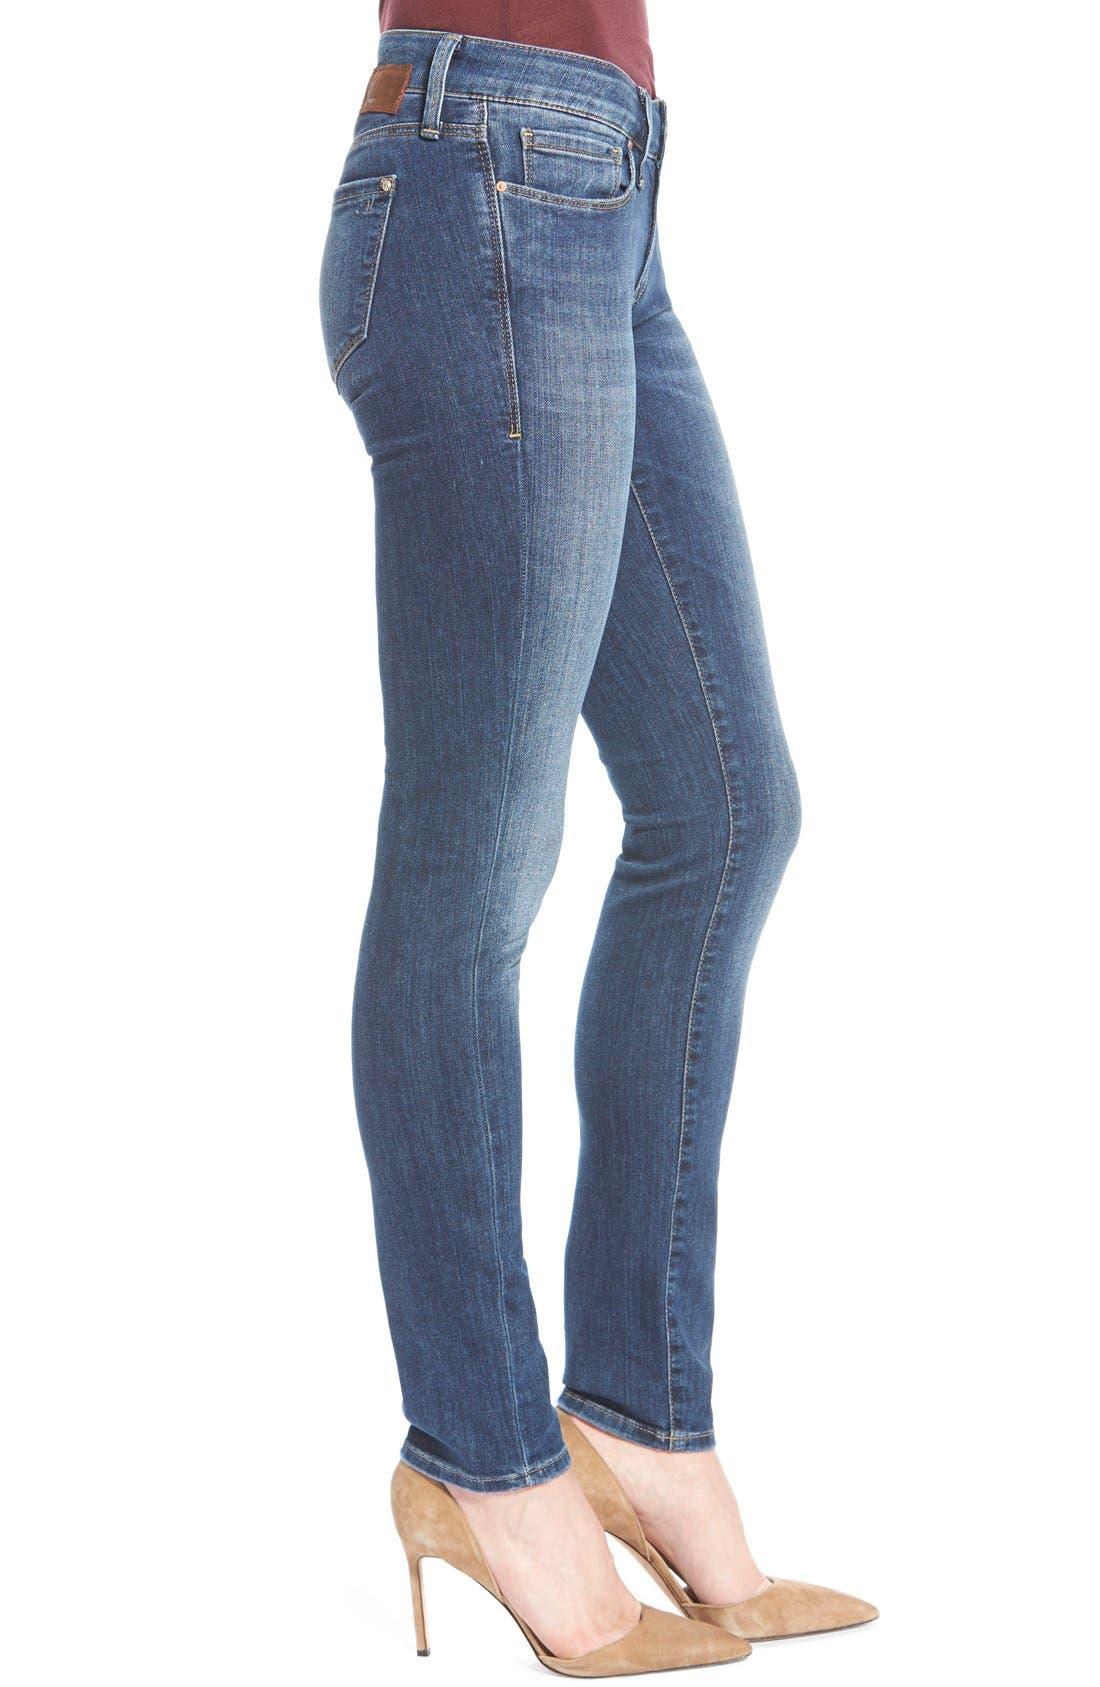 Alternate Image 3  - Mavi Jeans 'Serena' Stretch Low Rise Skinny Jeans (Indigo Nolita)